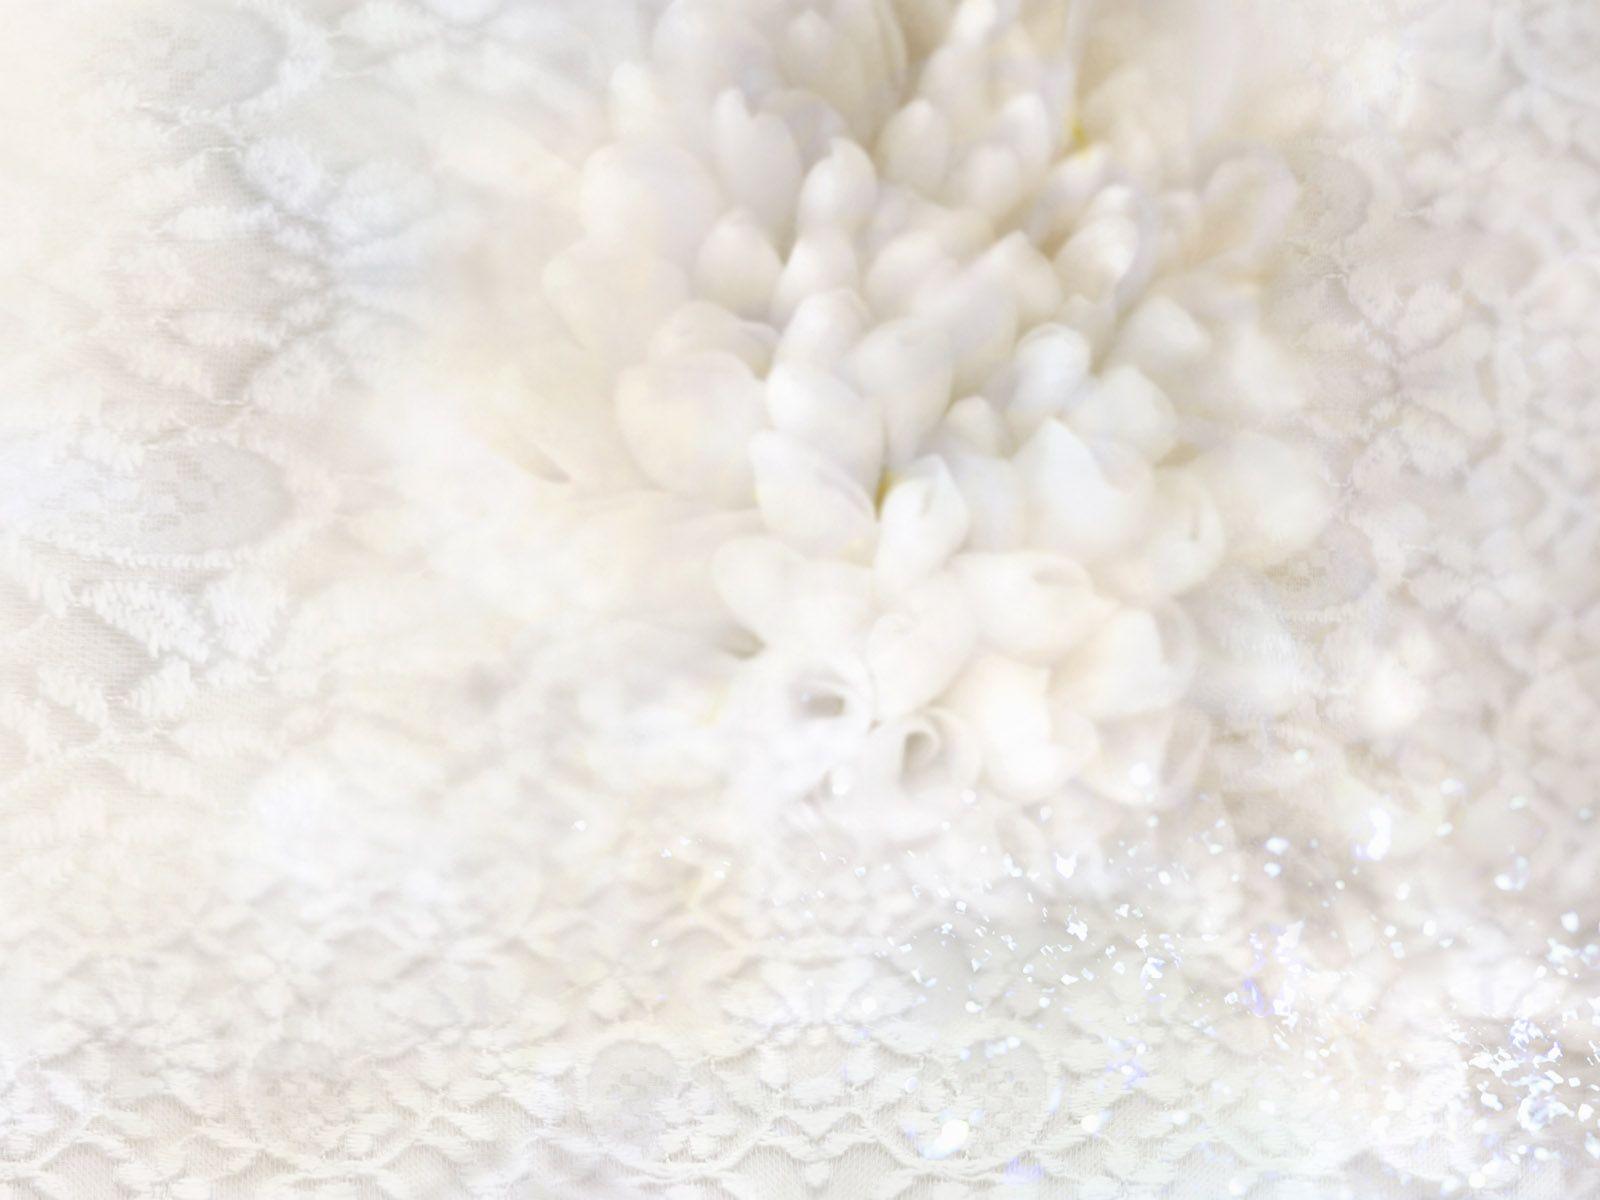 Wedding background wallpaper wallpapersafari for White wedding wallpaper